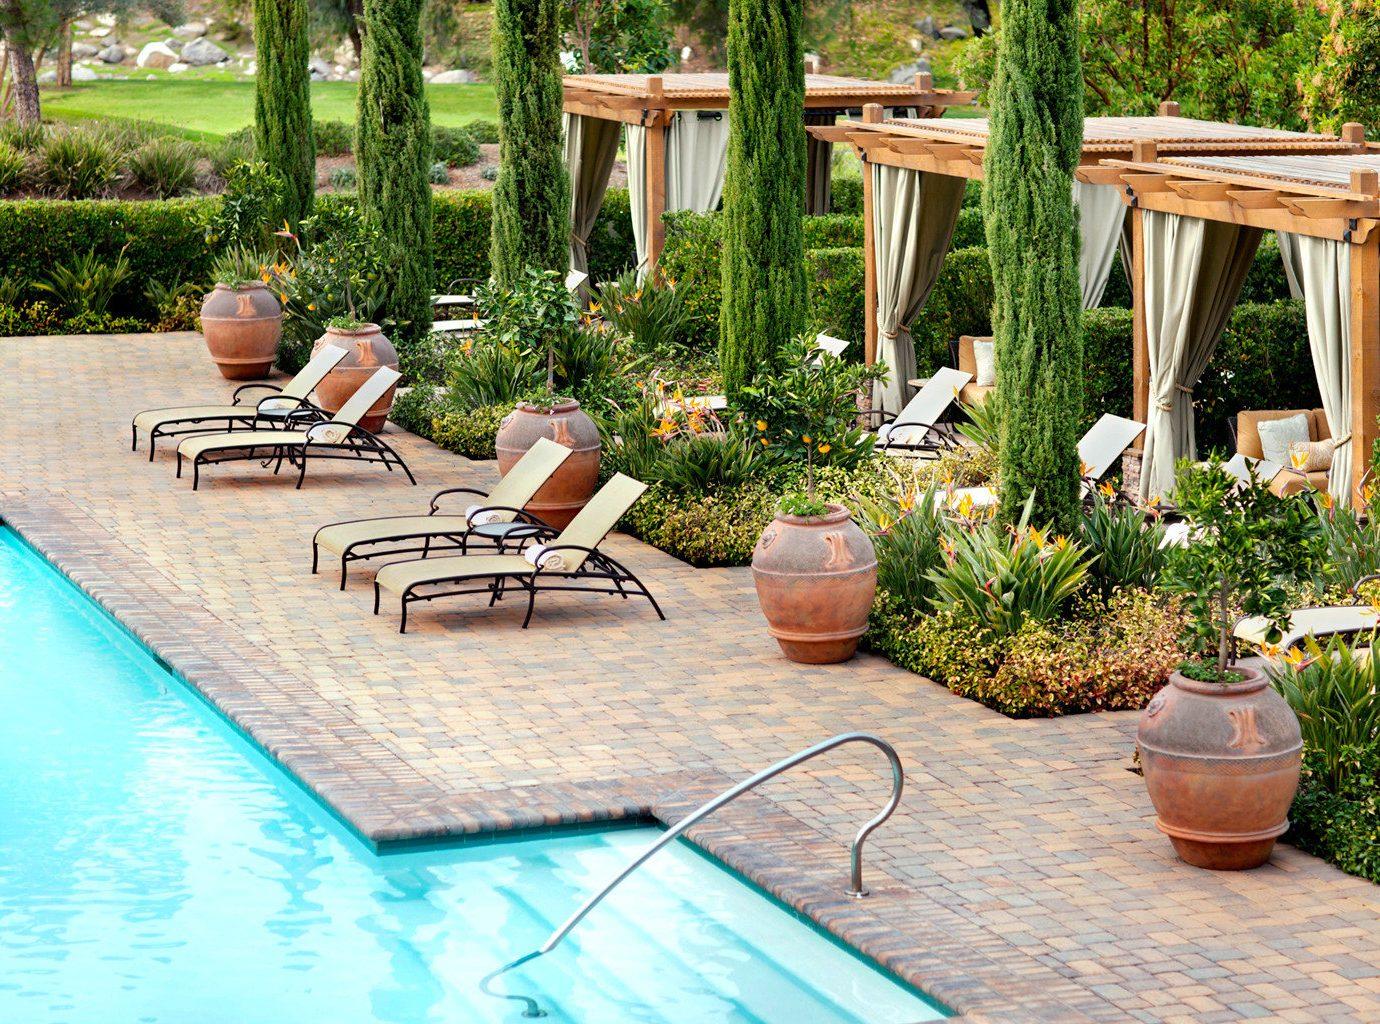 Pool At Rancho Bernardo Inn In San Diego, Ca